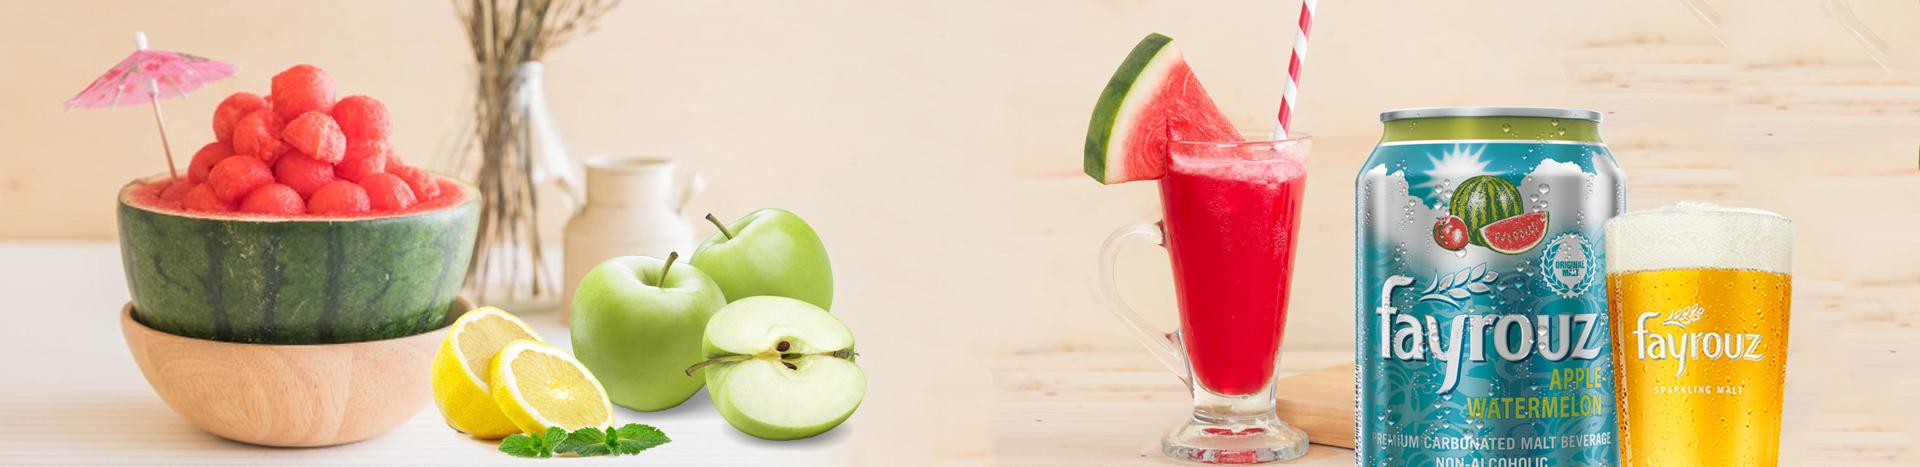 Fayrouz Watermelon & Apple With Lemon